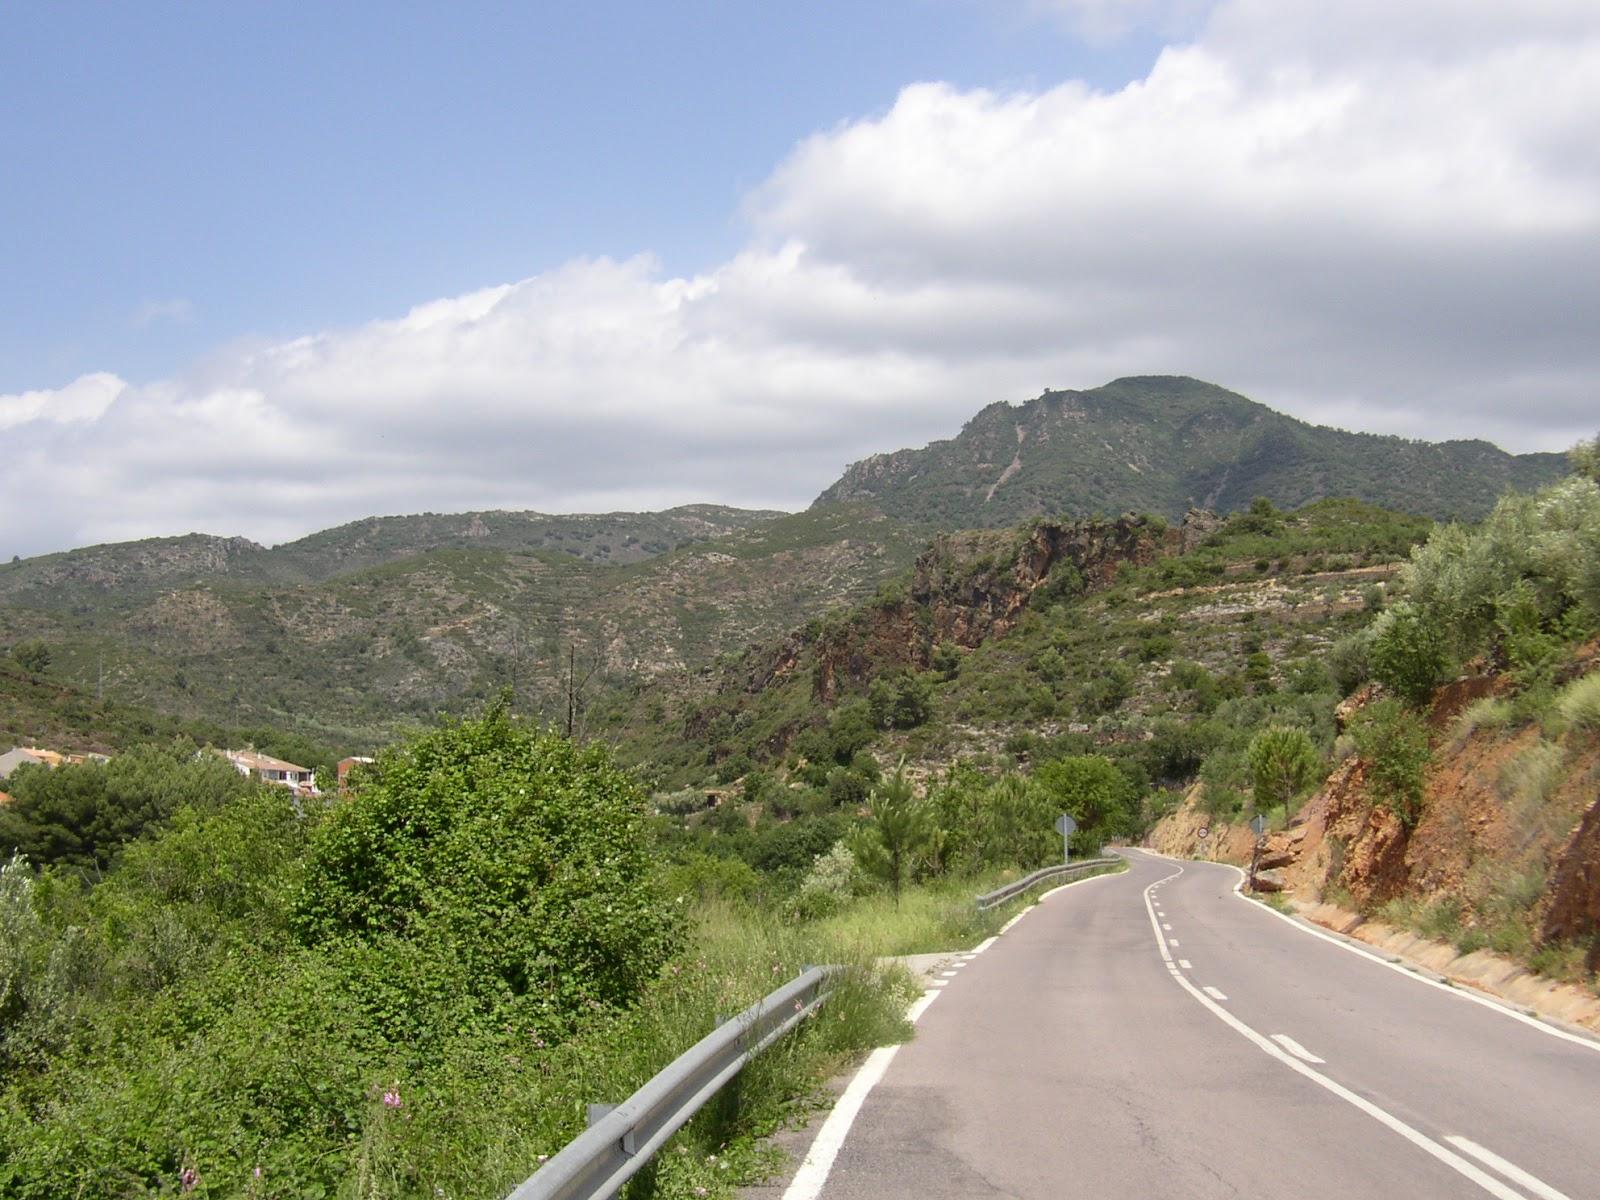 Road in Sierra de Espadán mountain range, Castellón, Valencia